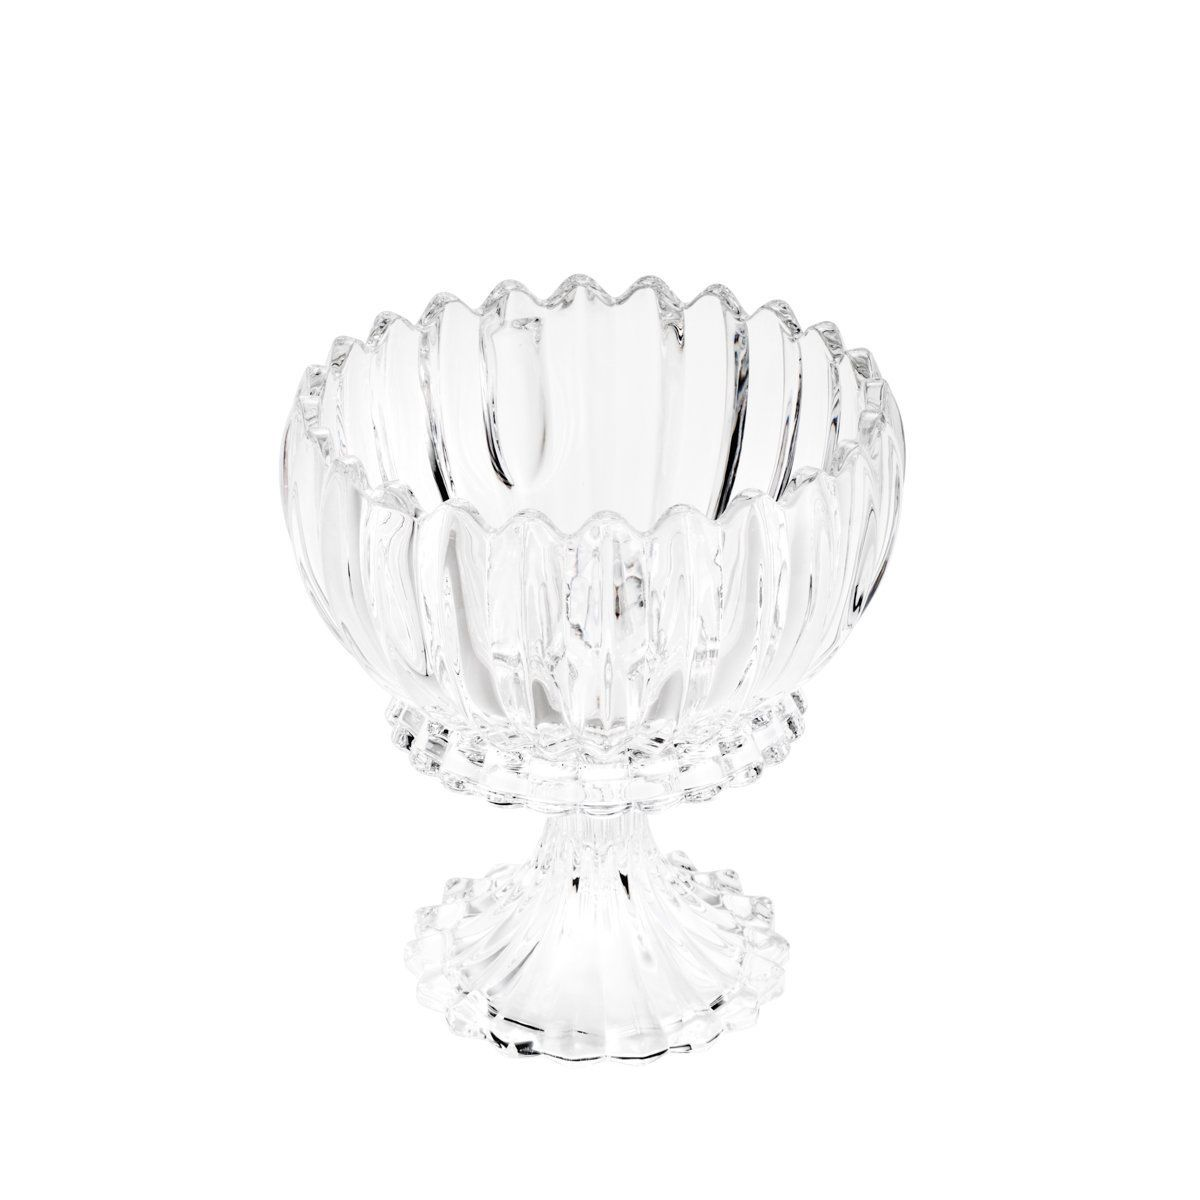 Bomboniere 24,5 cm de cristal transparente com tampa e pé Geneva Wolff - 25531